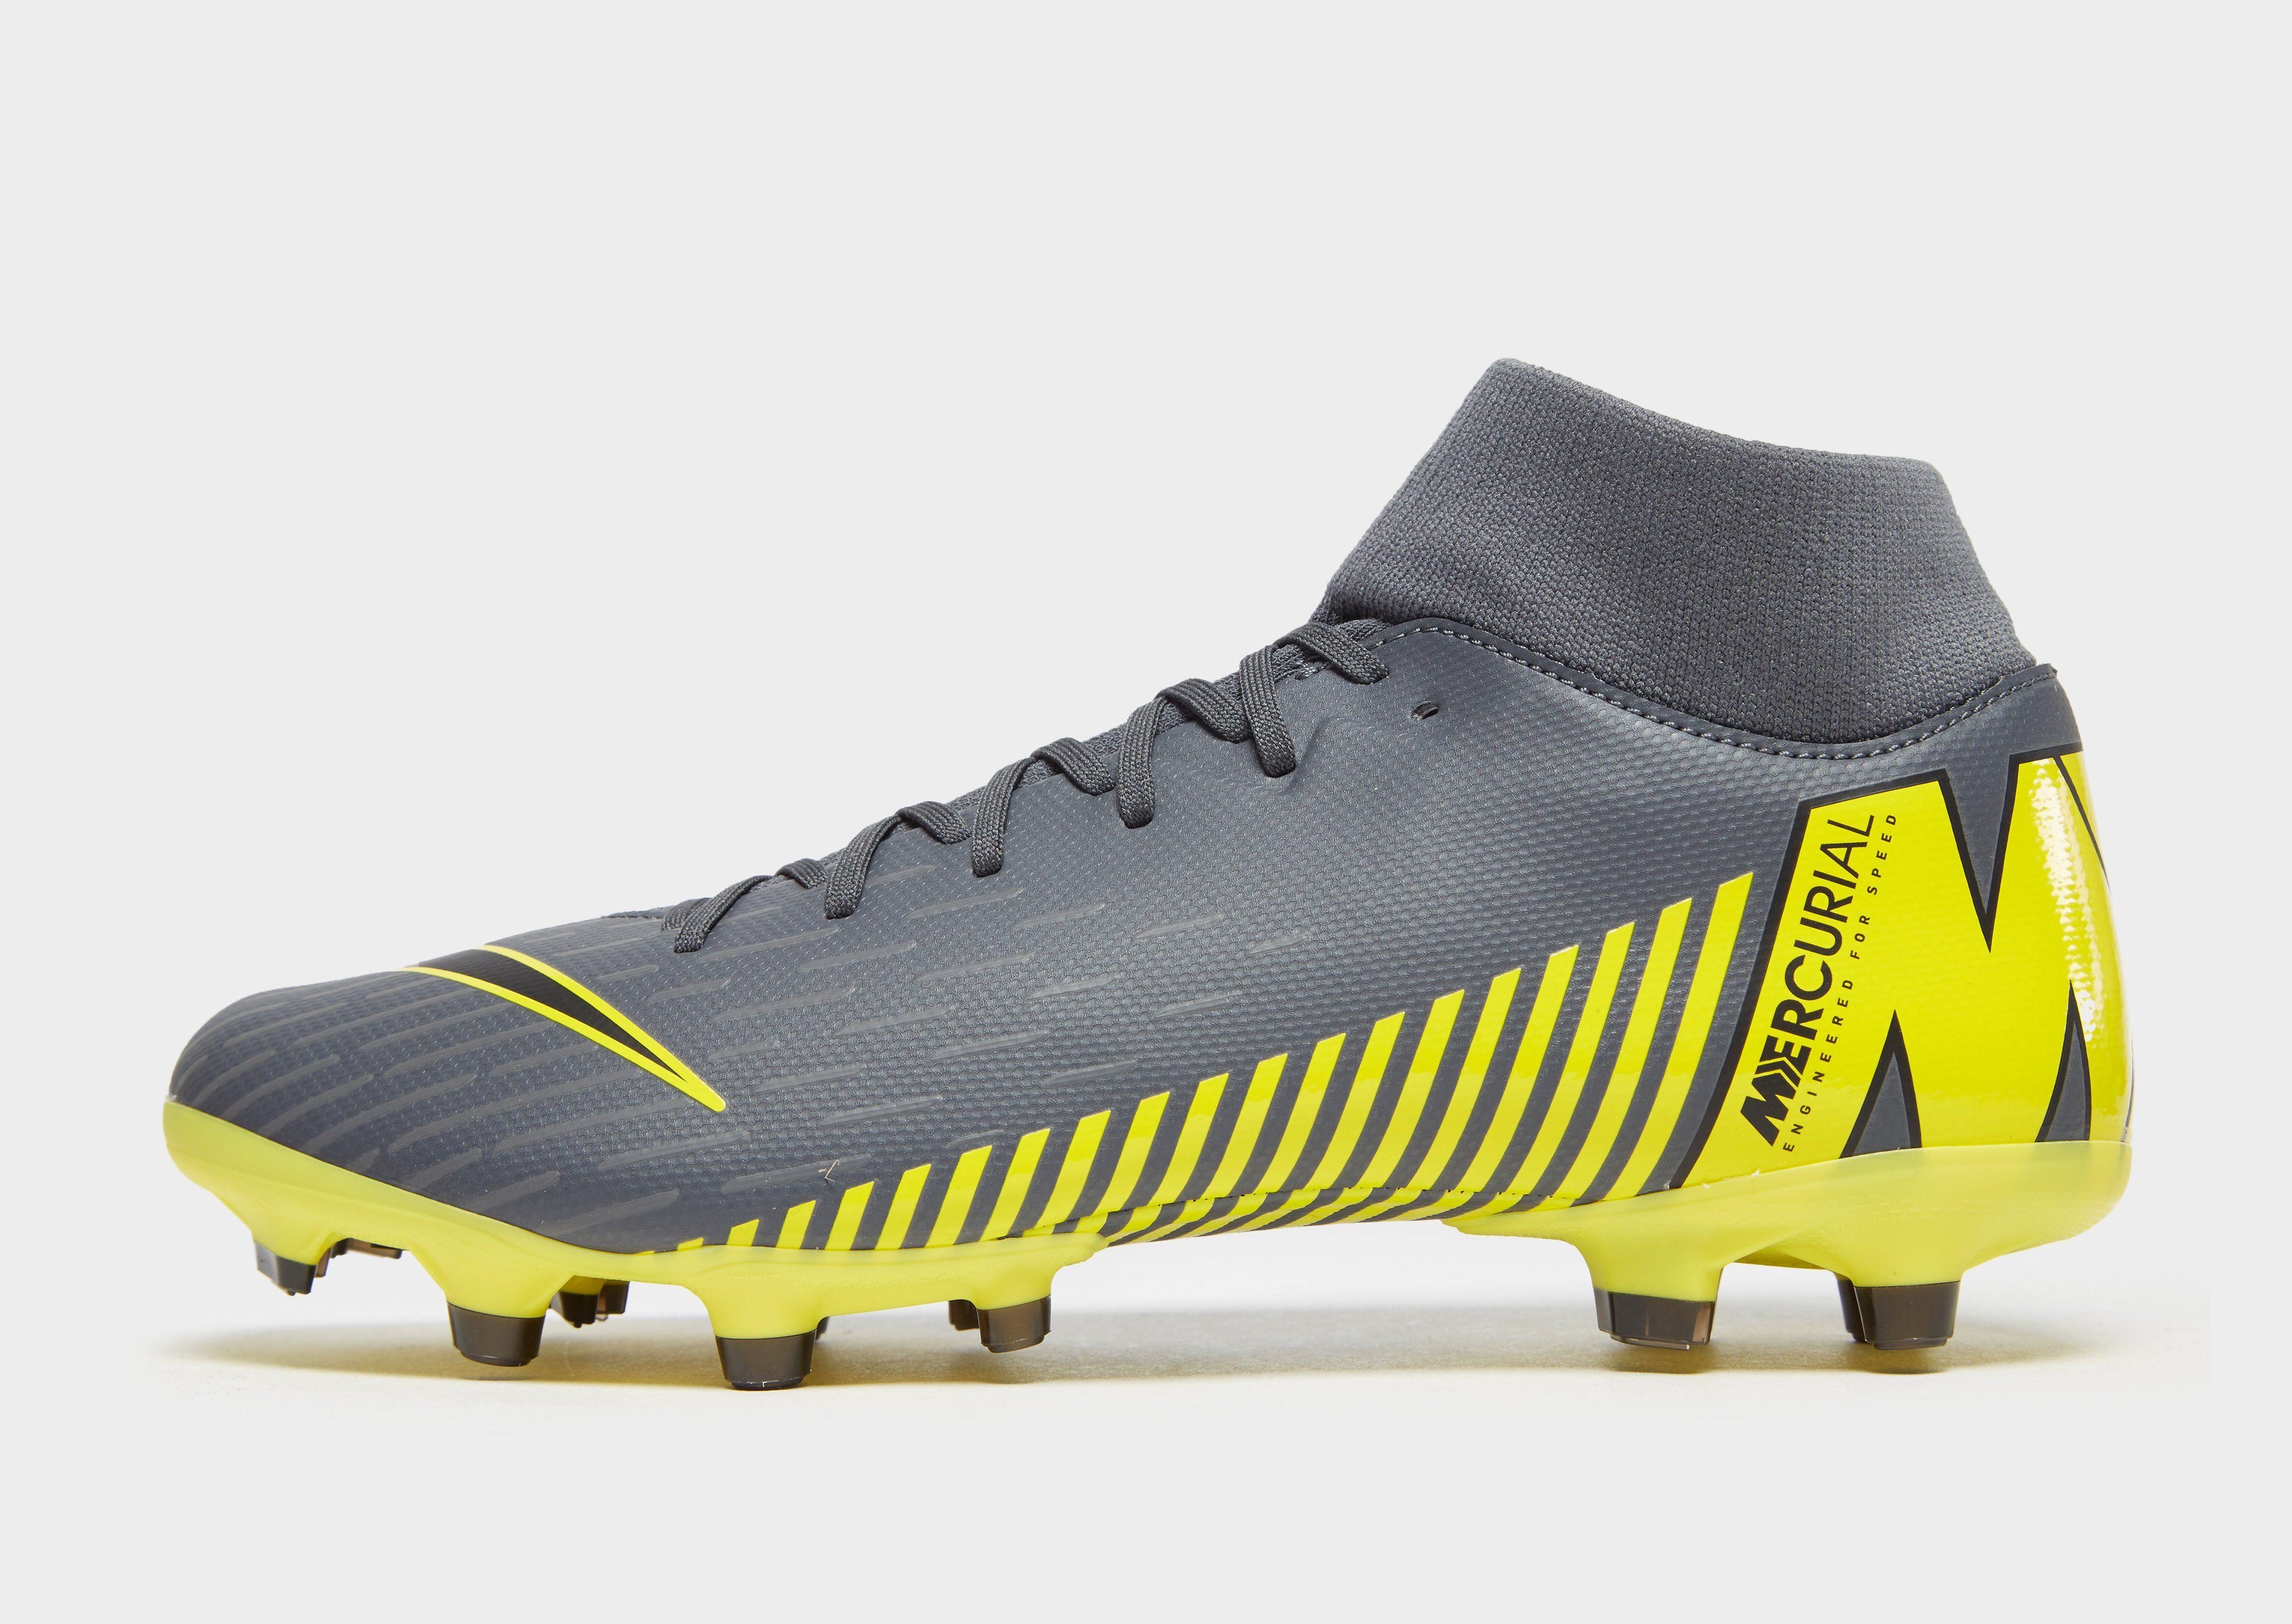 dab52929f67fef NIKE Nike Mercurial Superfly 6 Academy MG Multi-Ground Football Boot ...